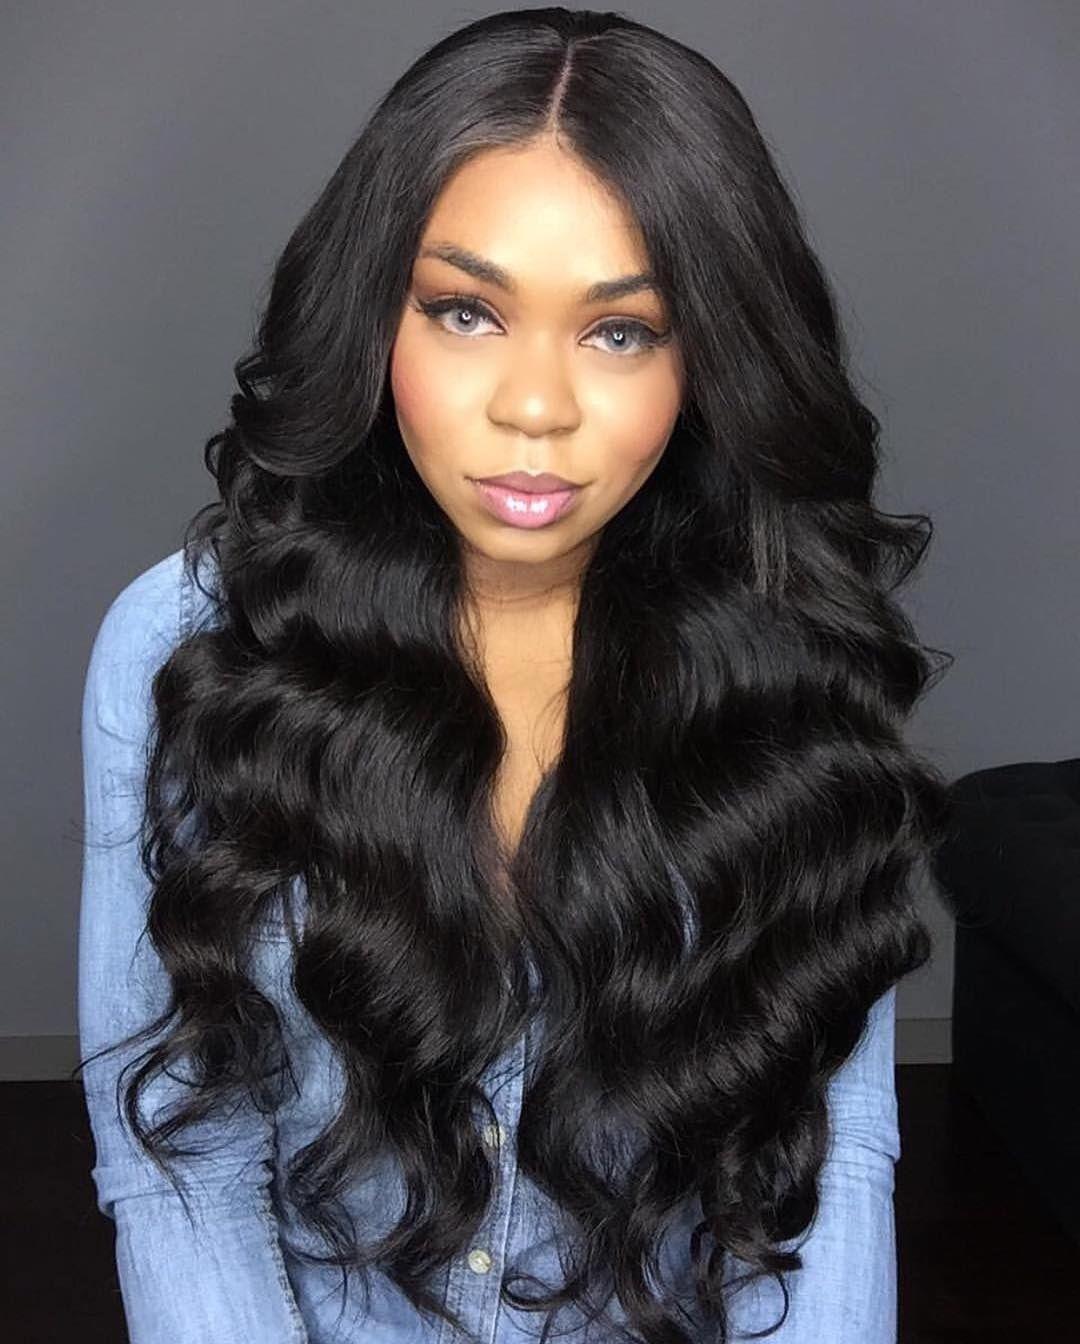 body wave hairstyles 2018 black - wavy haircut